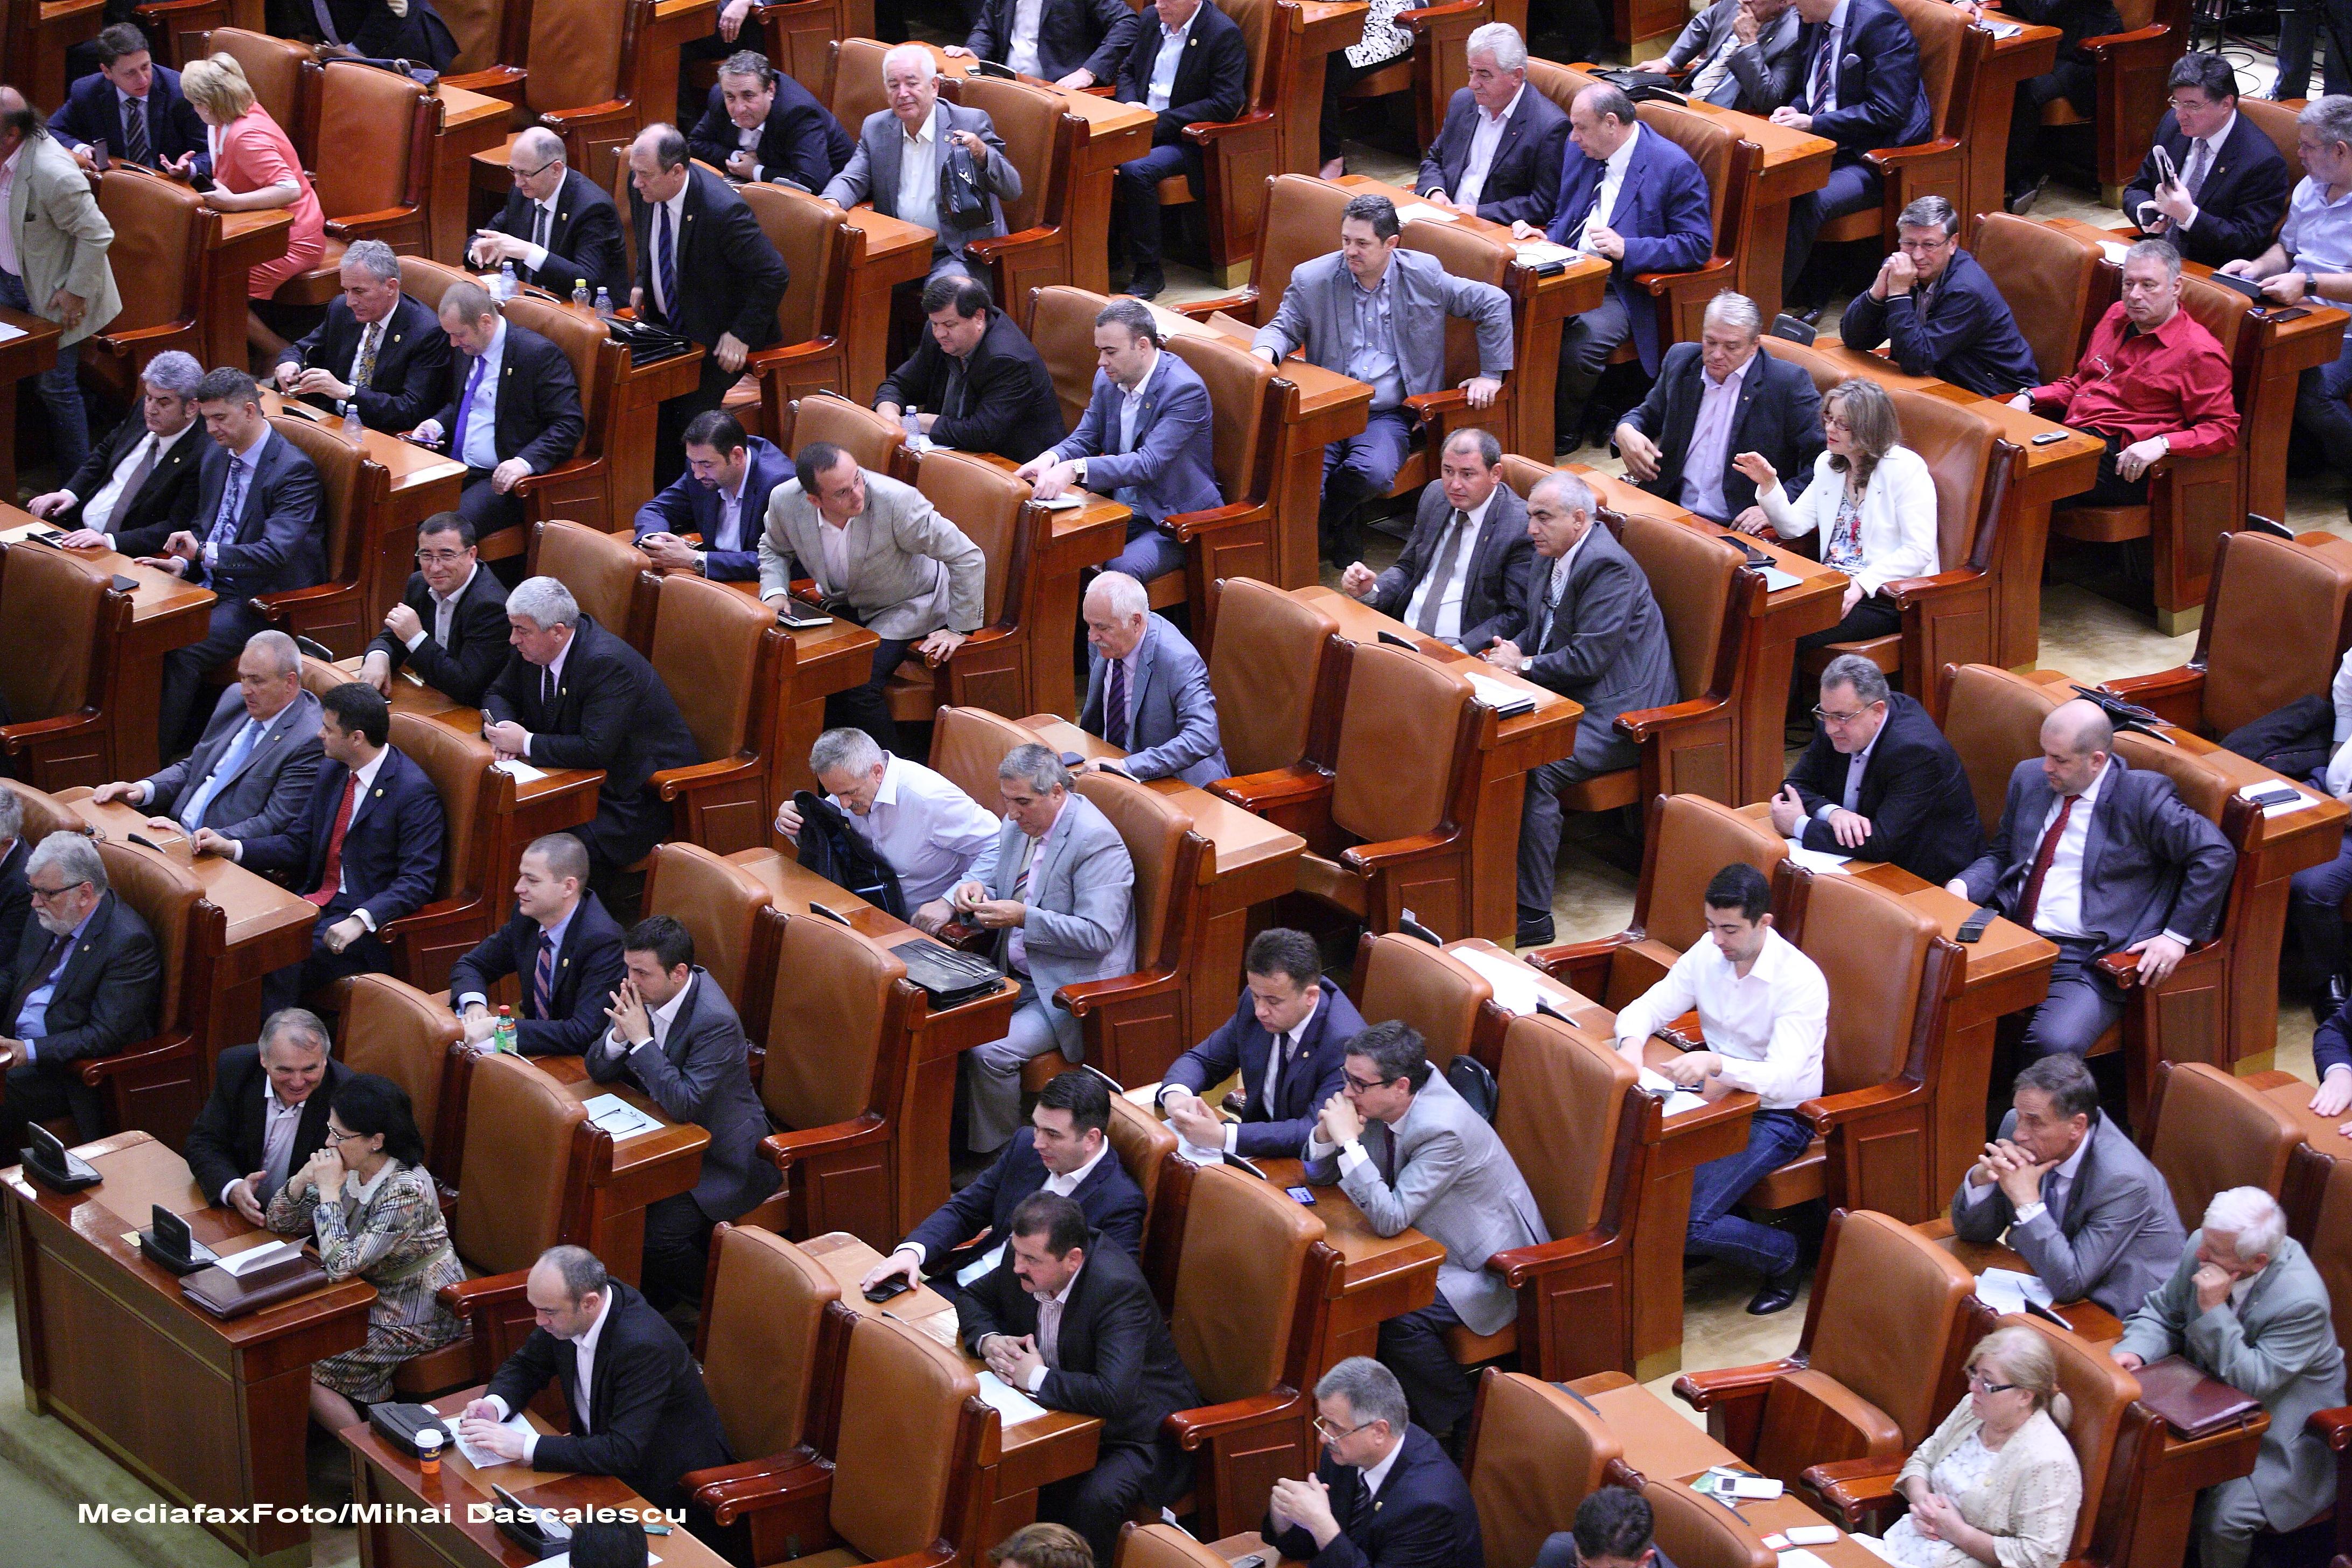 Angajatii din administratia publica centrala vor avea pauza de masa, de la 13 la 14. Lista completa a institutiilor